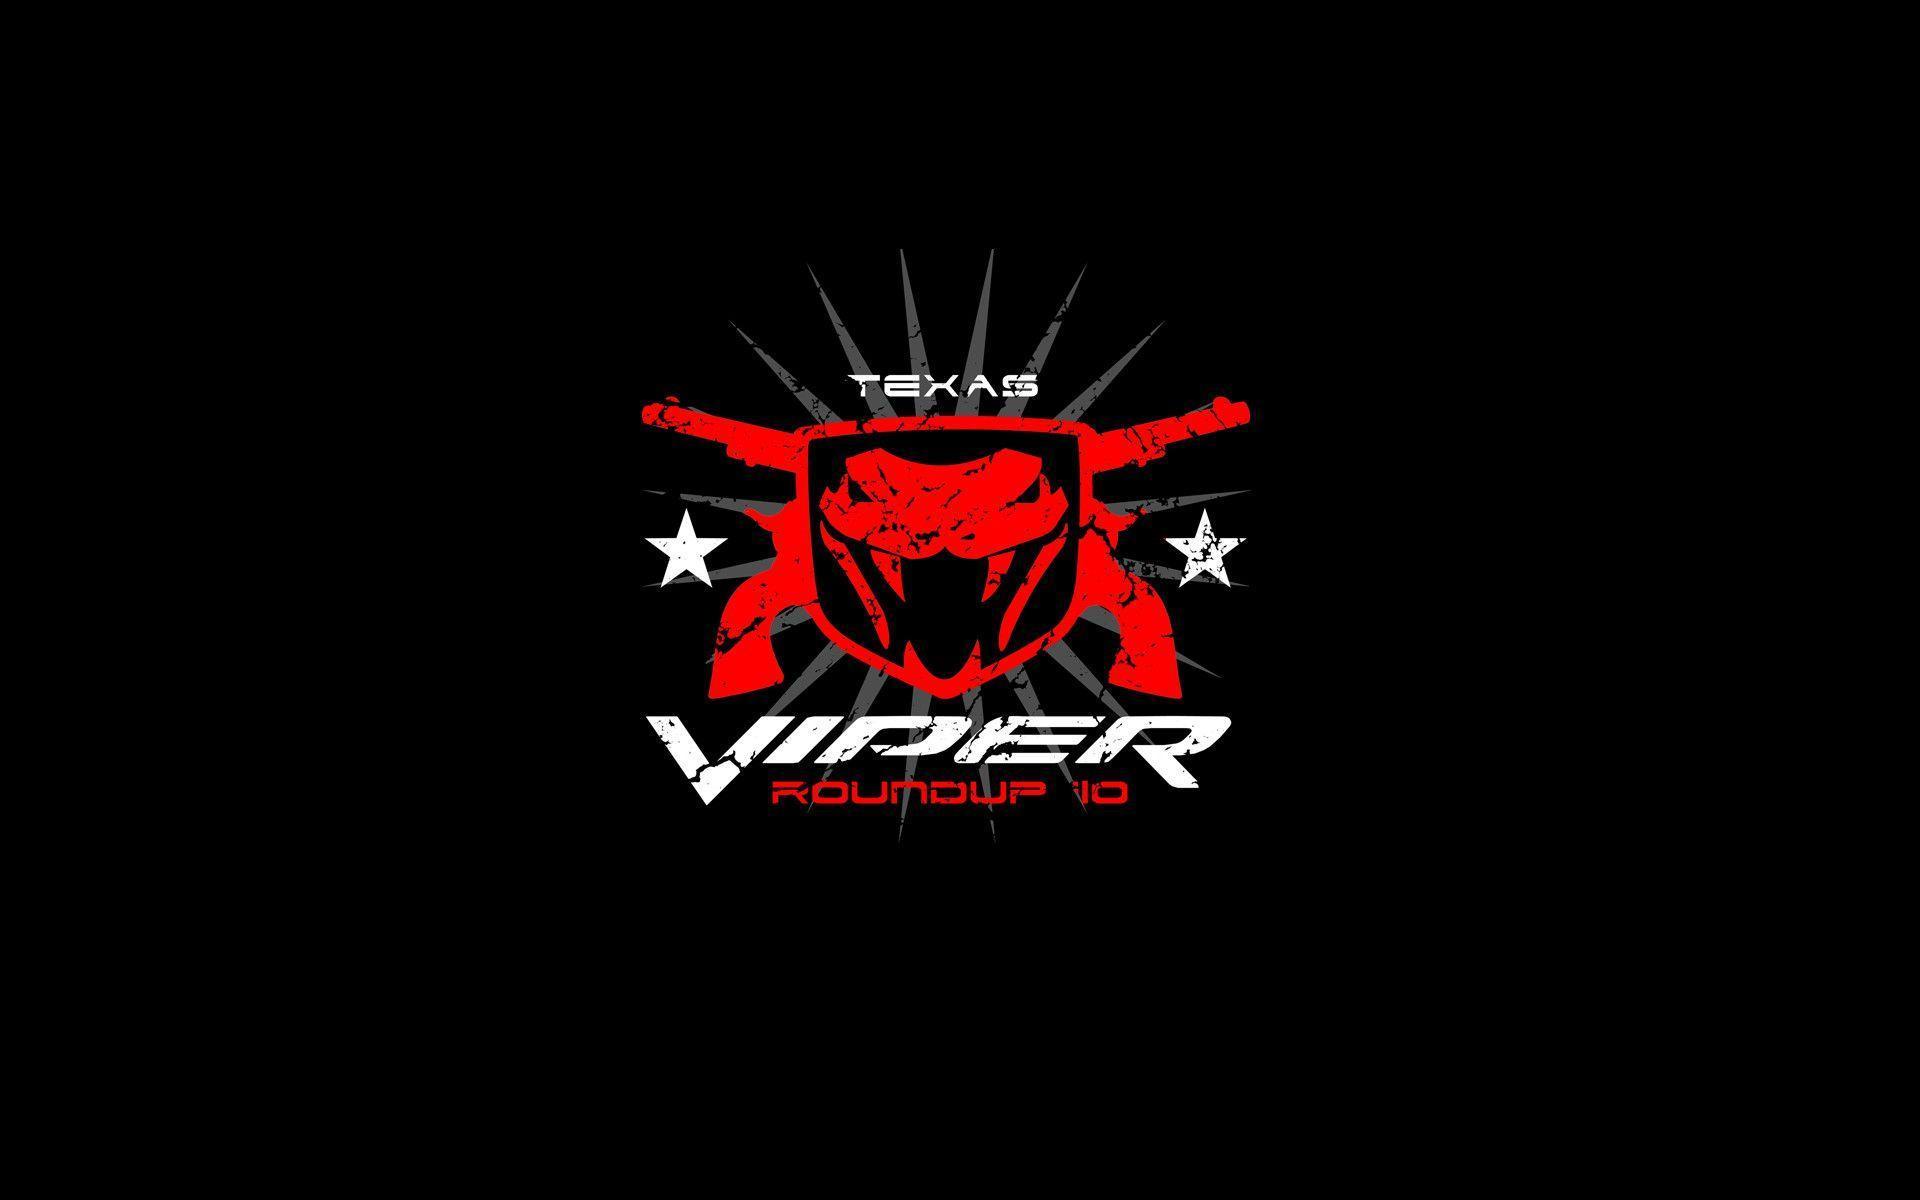 Viper Logo Wallpapers Top Free Viper Logo Backgrounds Wallpaperaccess